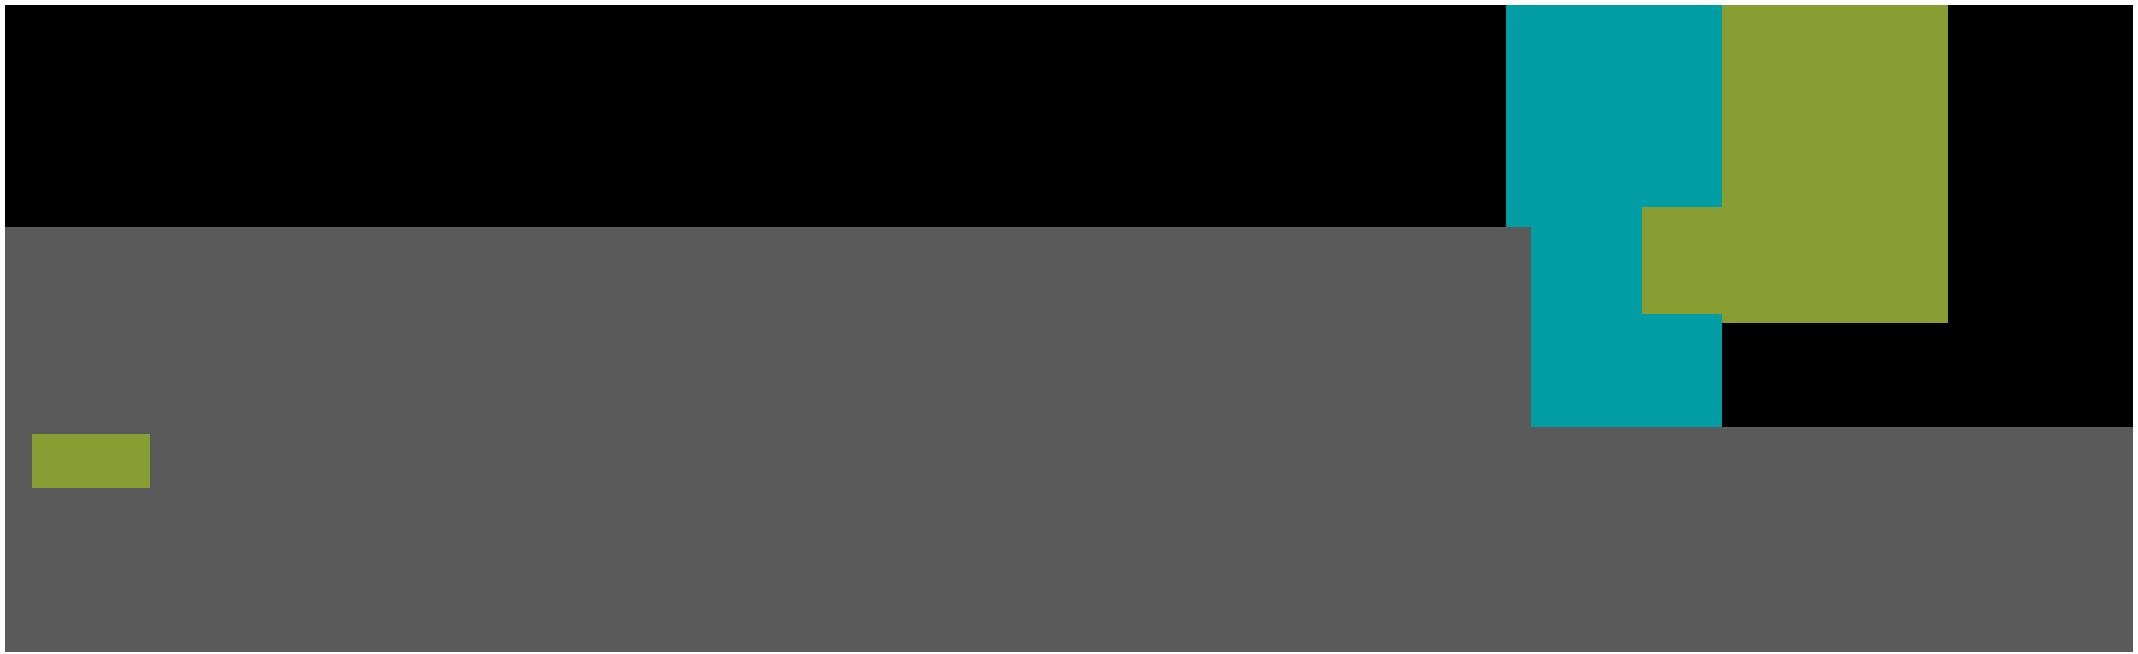 Logo Gemeinwohlökonomie